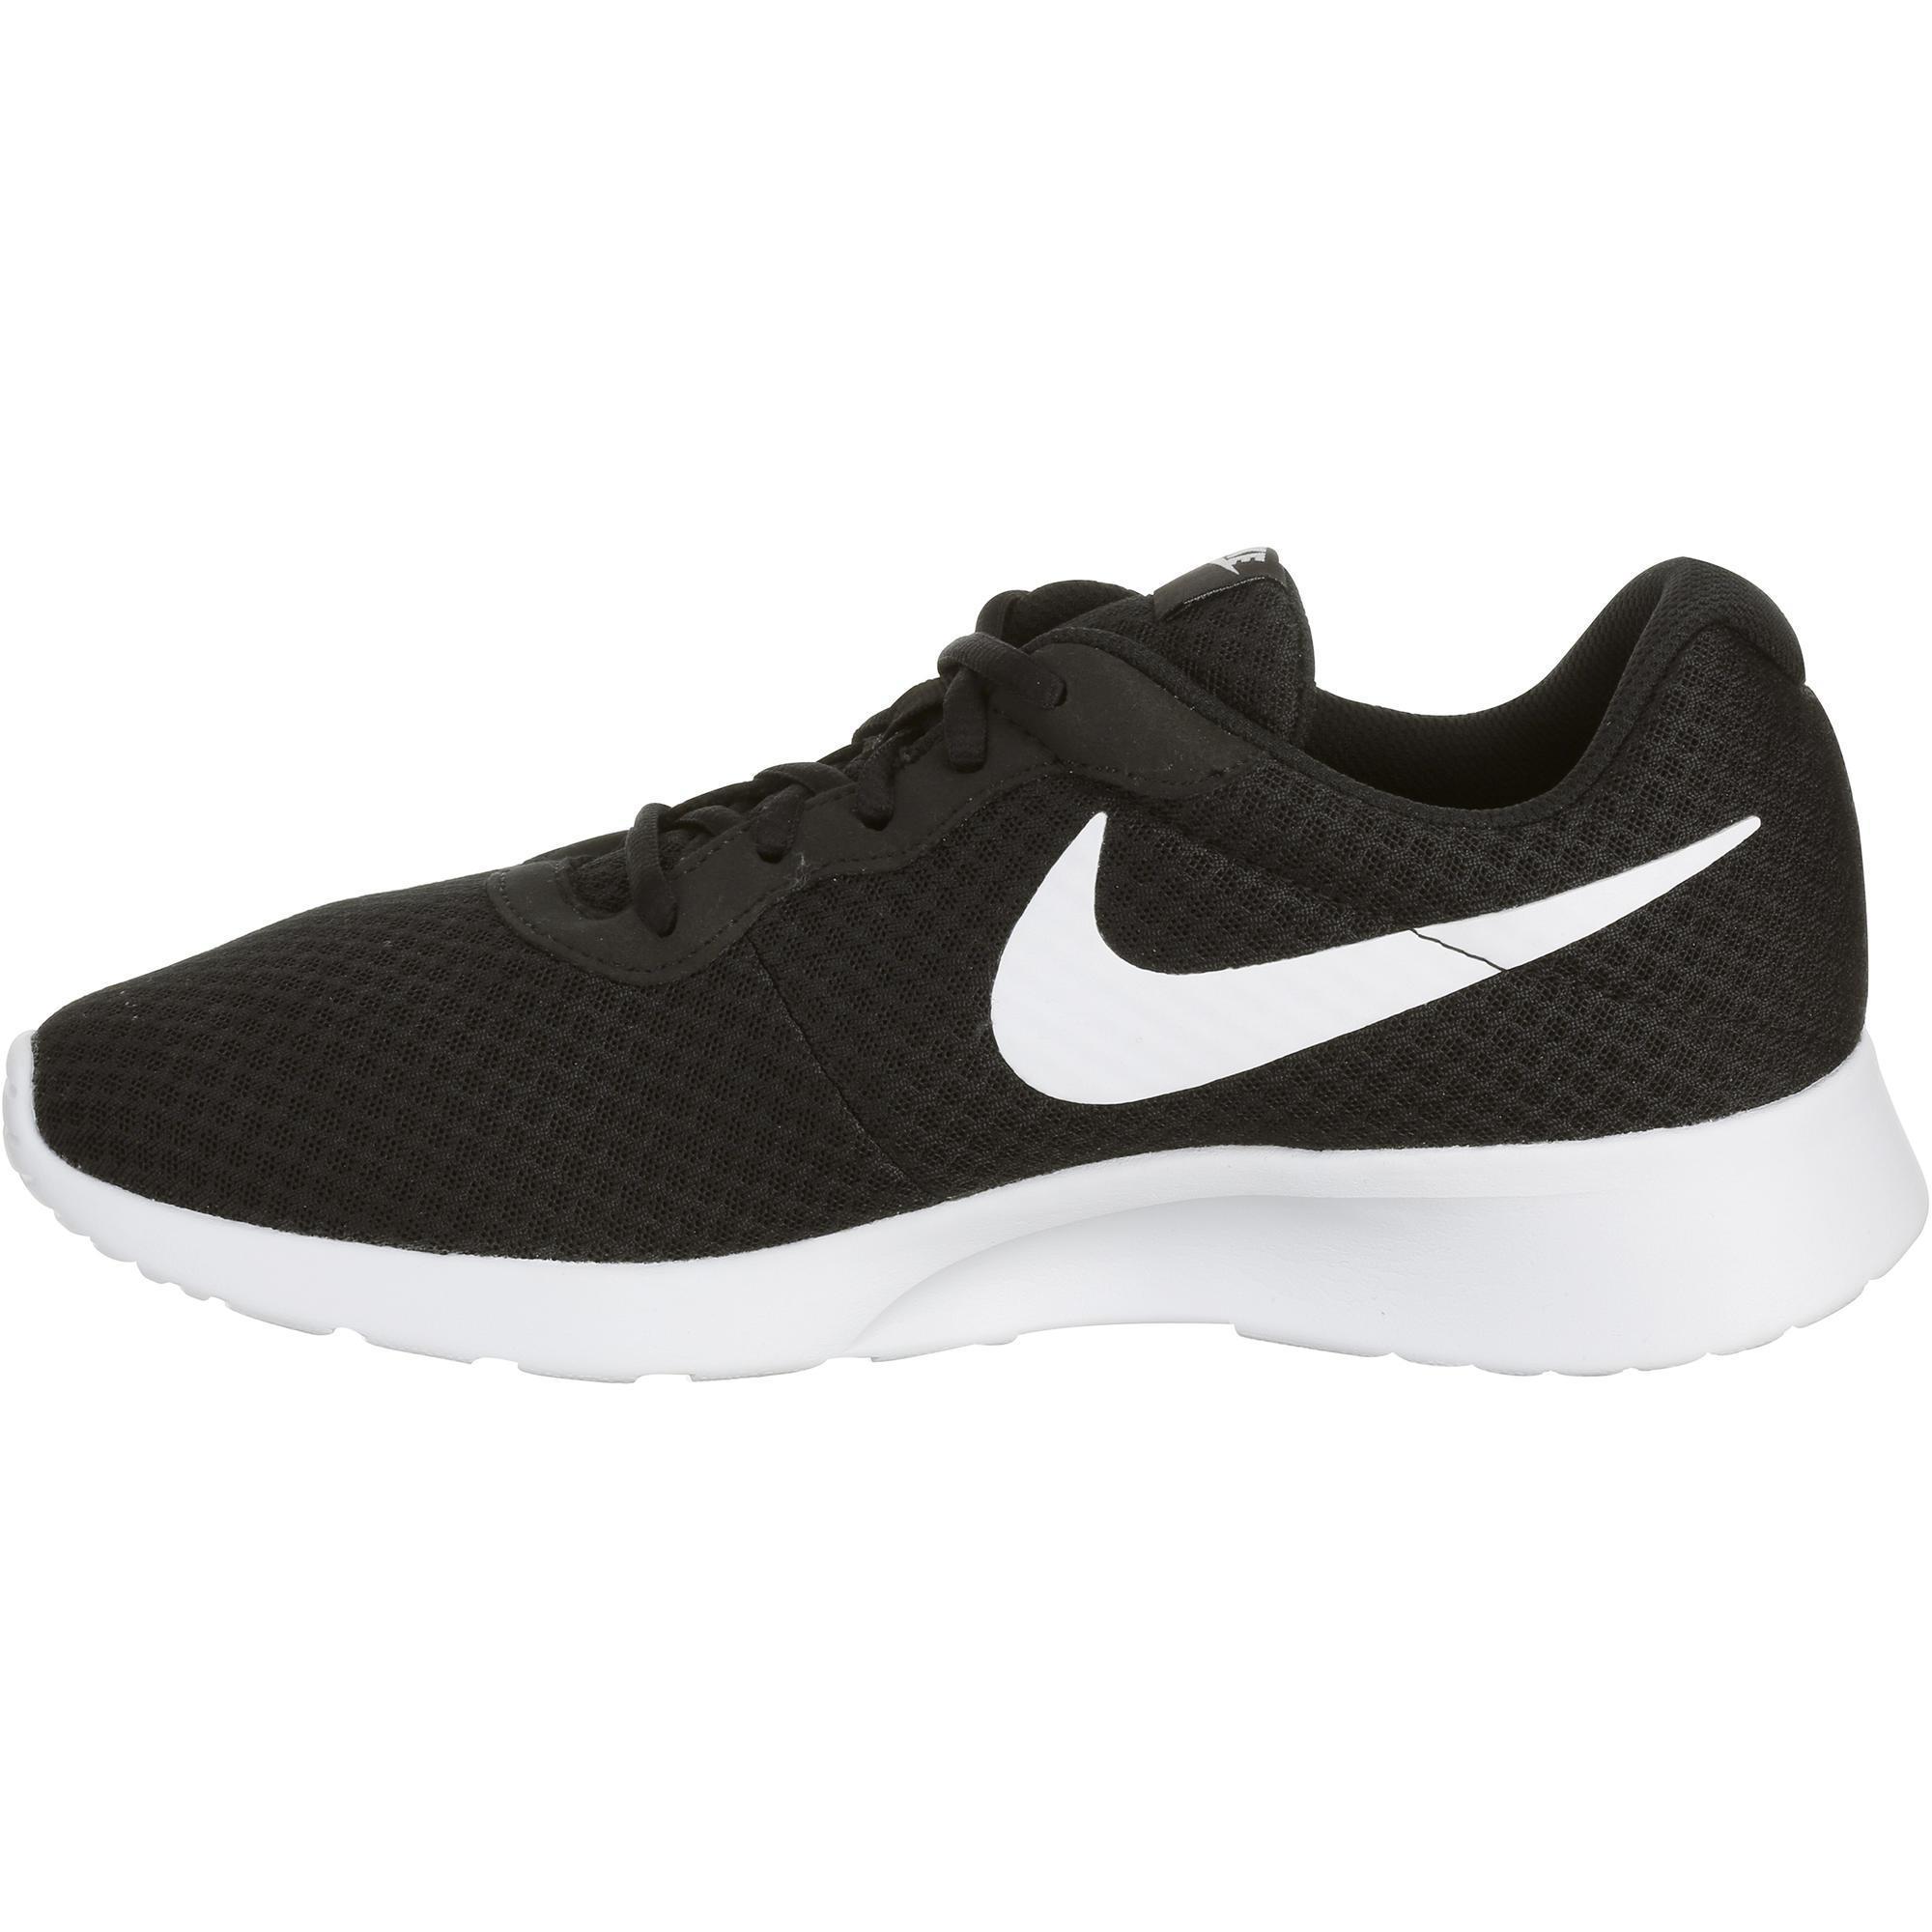 huge selection of 18cb6 2b5ae Sportive Marche Tanjun Homme Nike Noir Chaussures aZqwnn5E